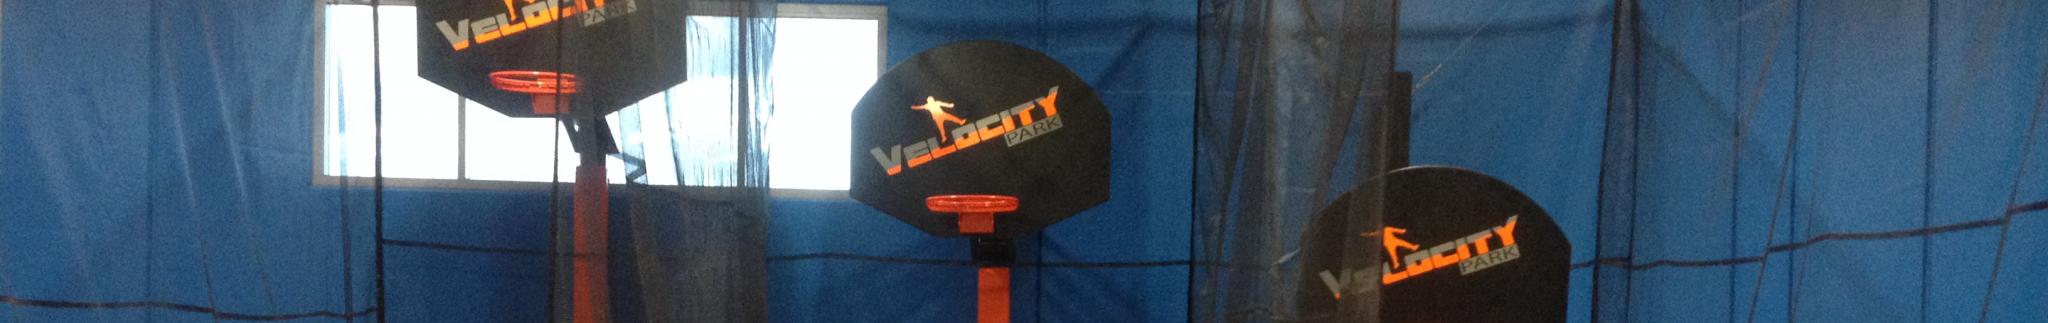 Velocity Indoor Trampoline Park Families Magazine